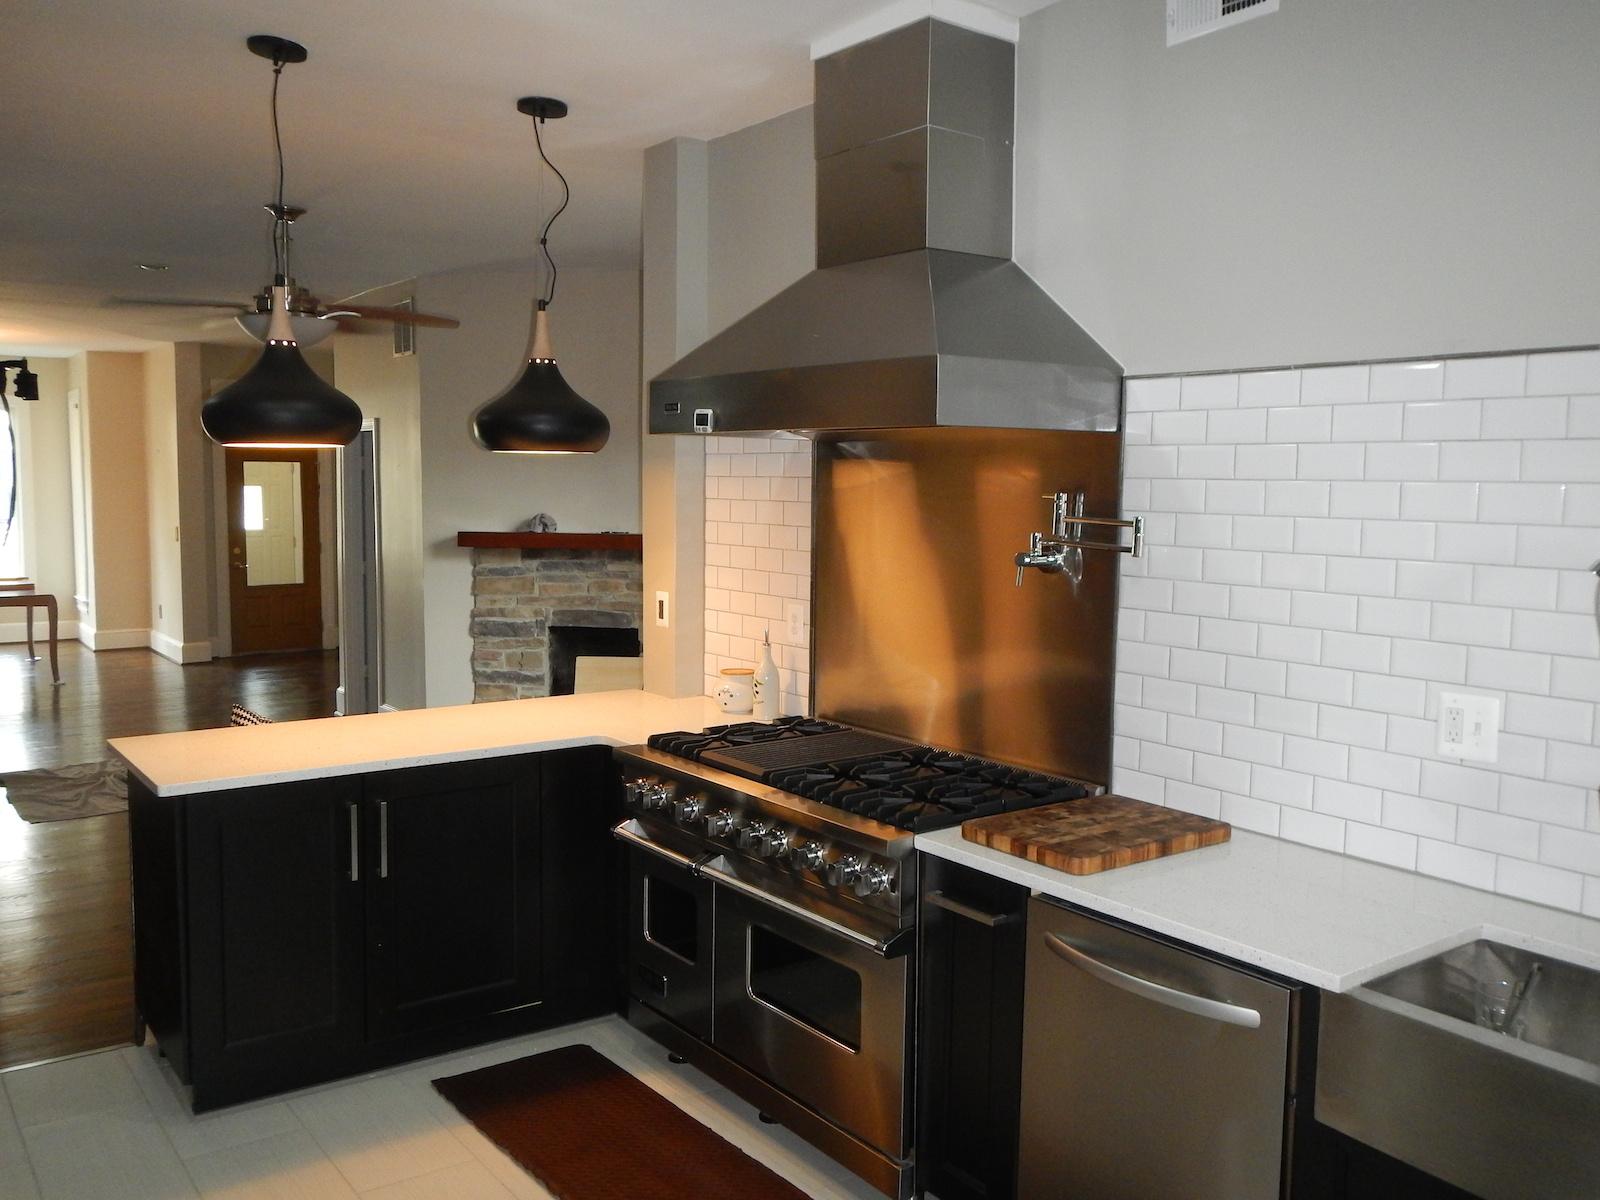 Politano kitchen Living room.jpg